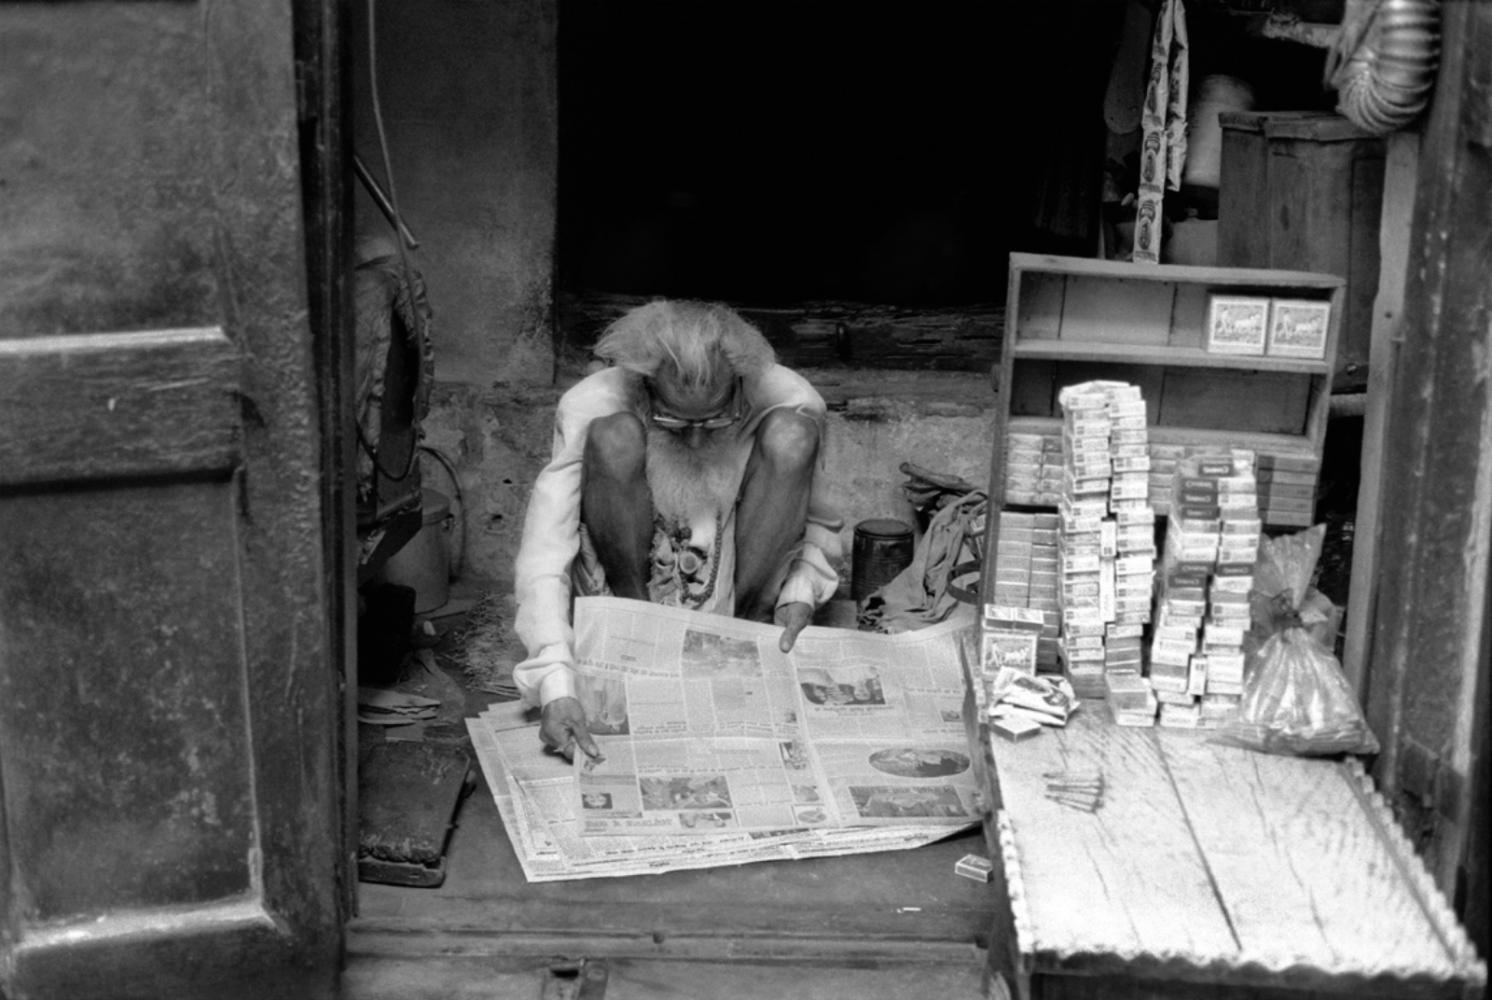 Cigarette Vendor, Varanasi, India, November 2003